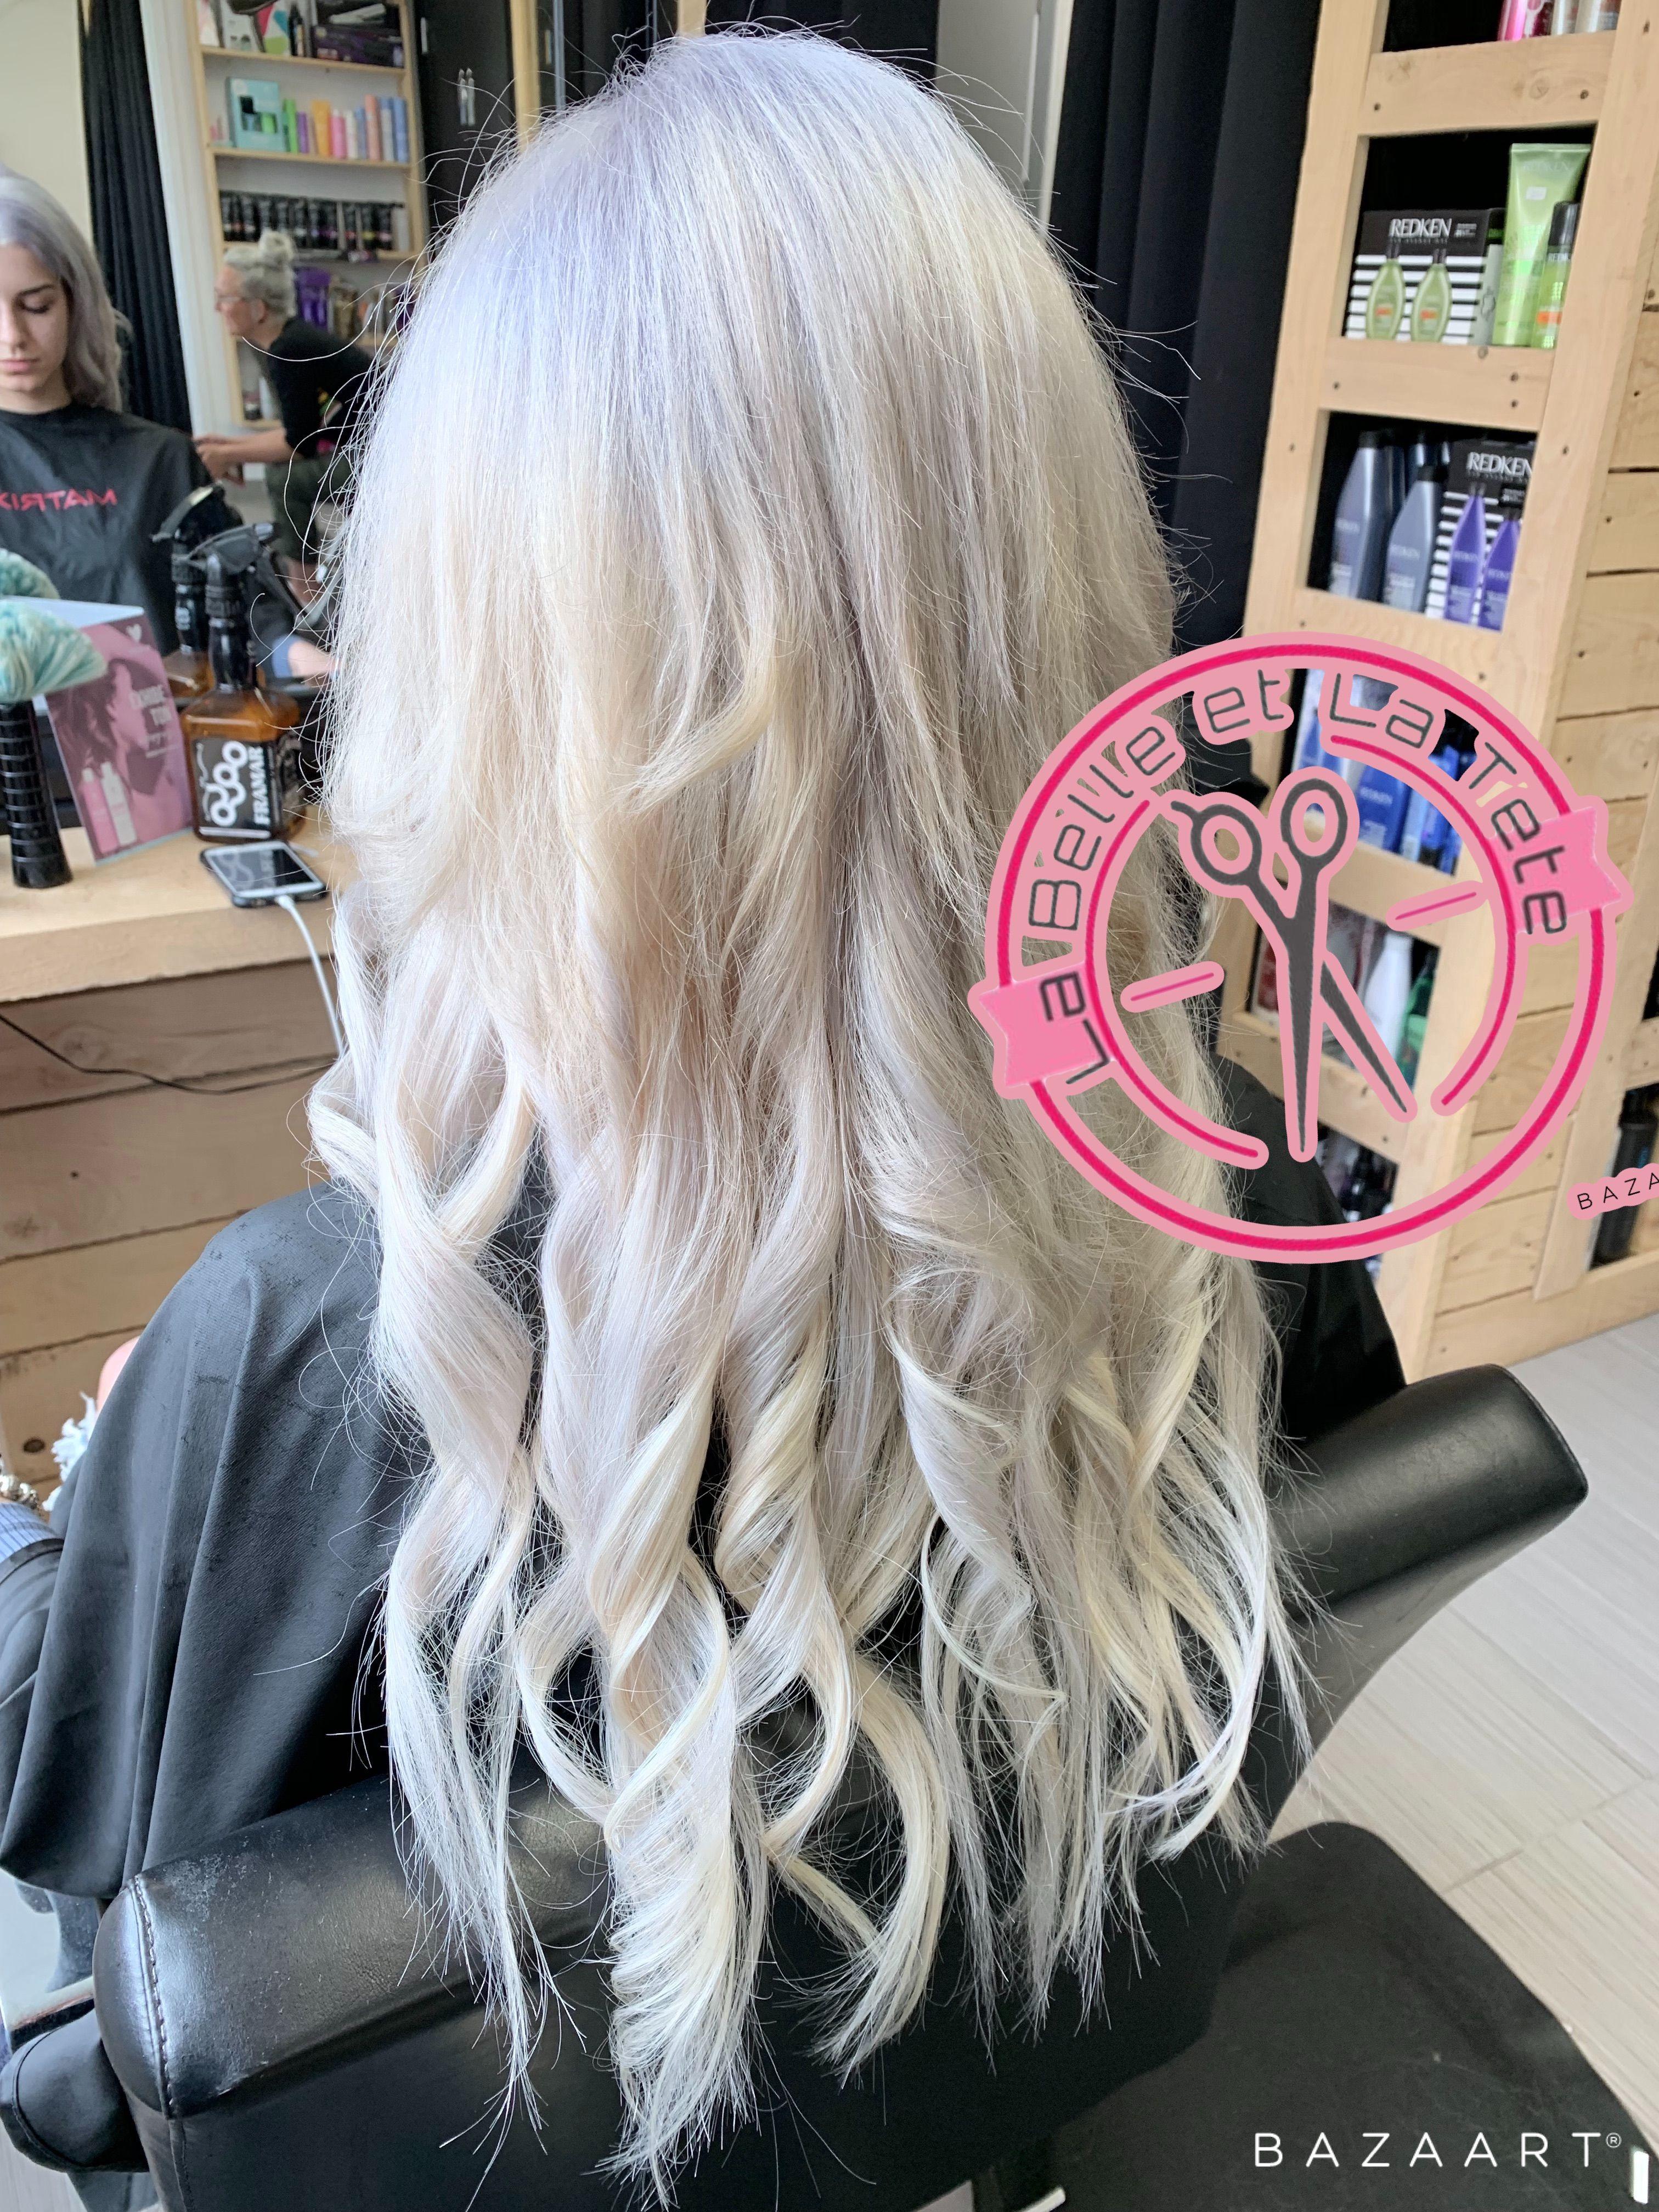 Rallonges Blond Polaire Hair Styles Redken Hair